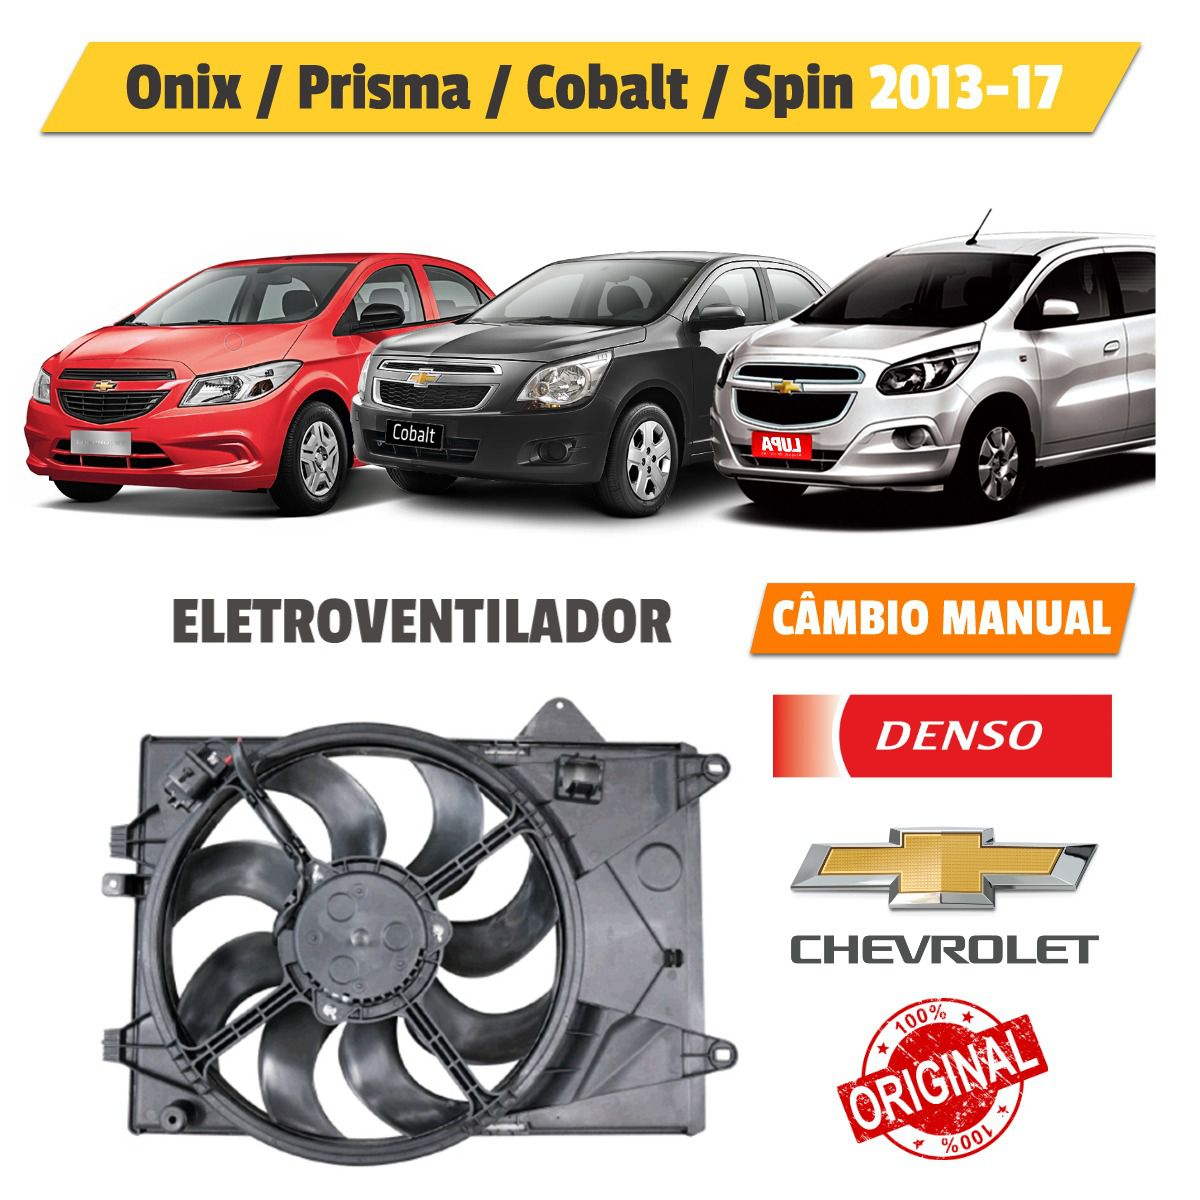 Eletroventilador Chevrolet Onix, Prisma, Cobalt, Spin T. Manual - Denso